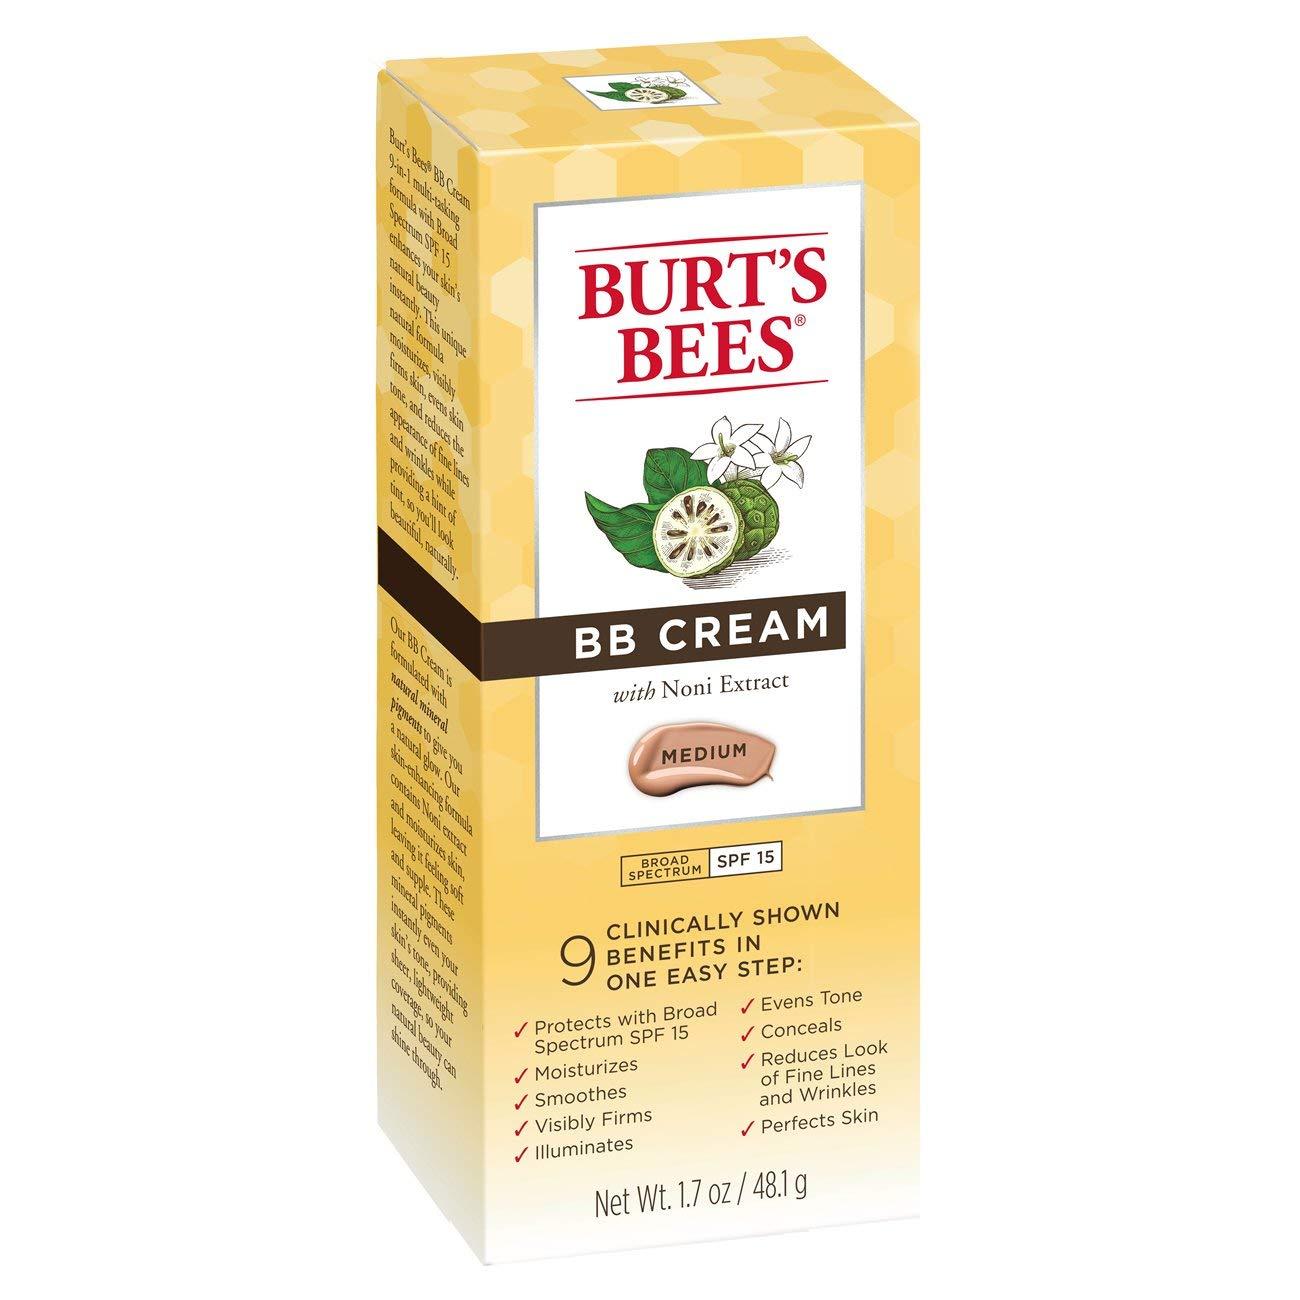 Burts Bees Bb Cream SPF 15 - Mediana - Base de 4,45 g: Amazon.es: Belleza